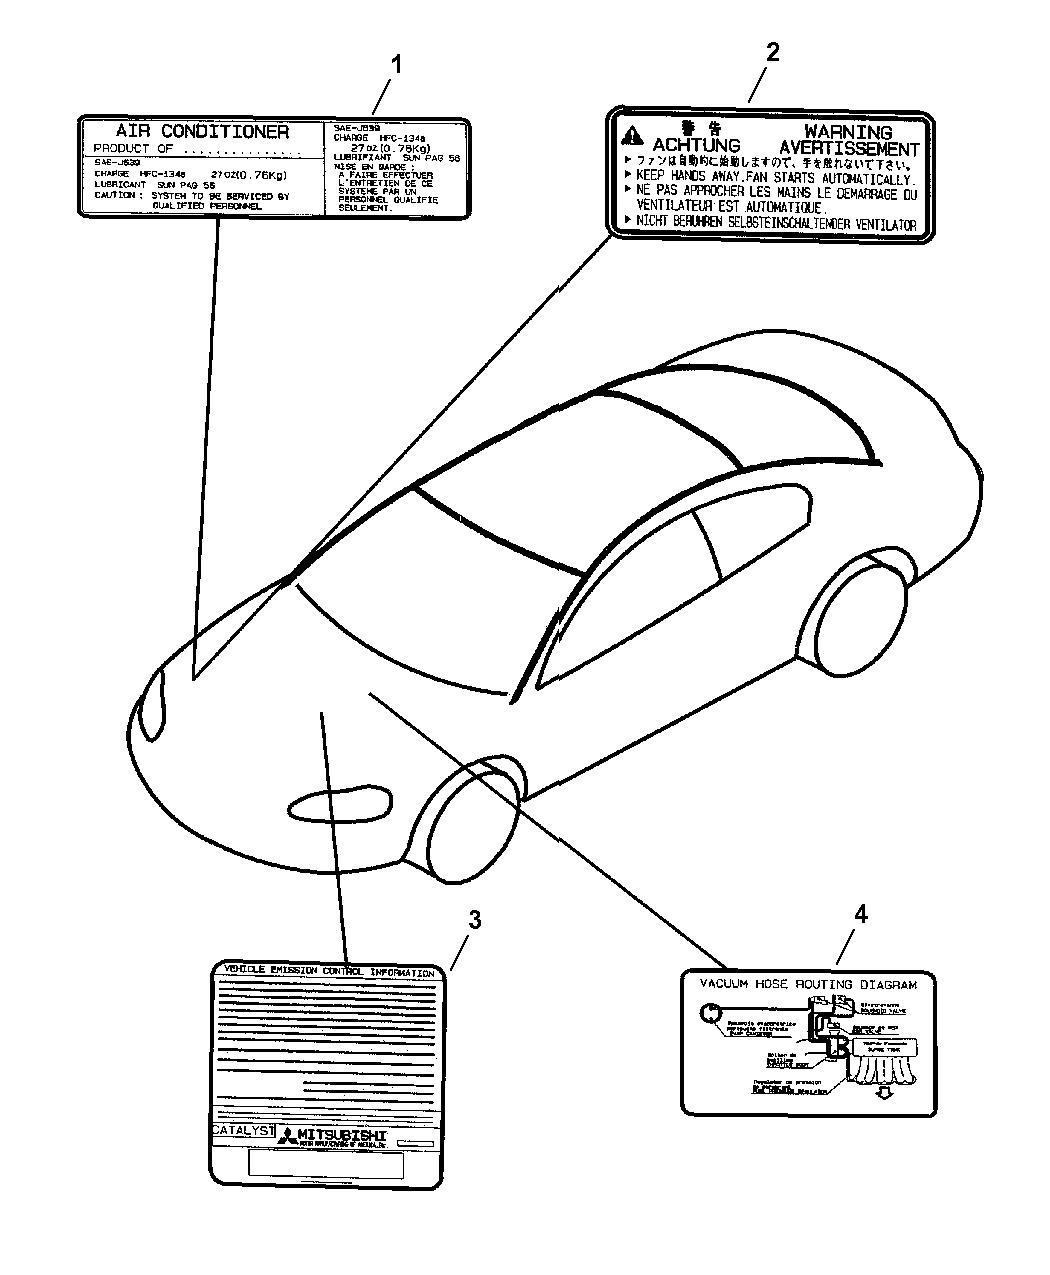 2004 Dodge Stratus Coupe Engine Compartment